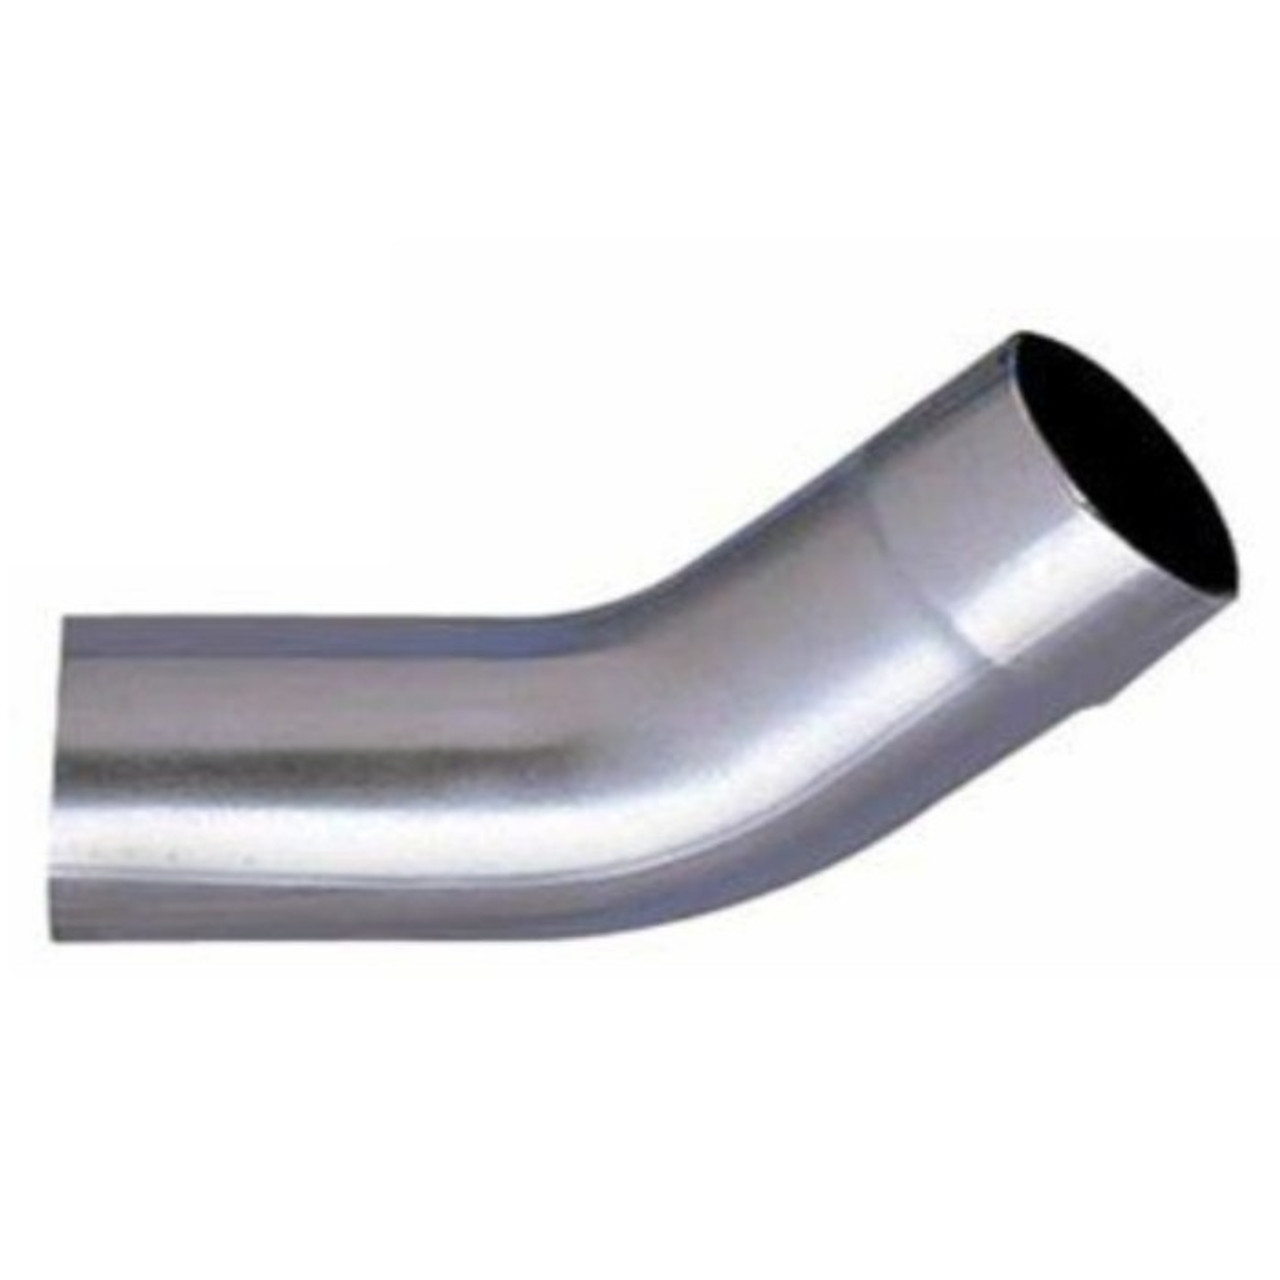 3 15 degree exhaust elbow 4 x 4 id od aluminized l315 0404a